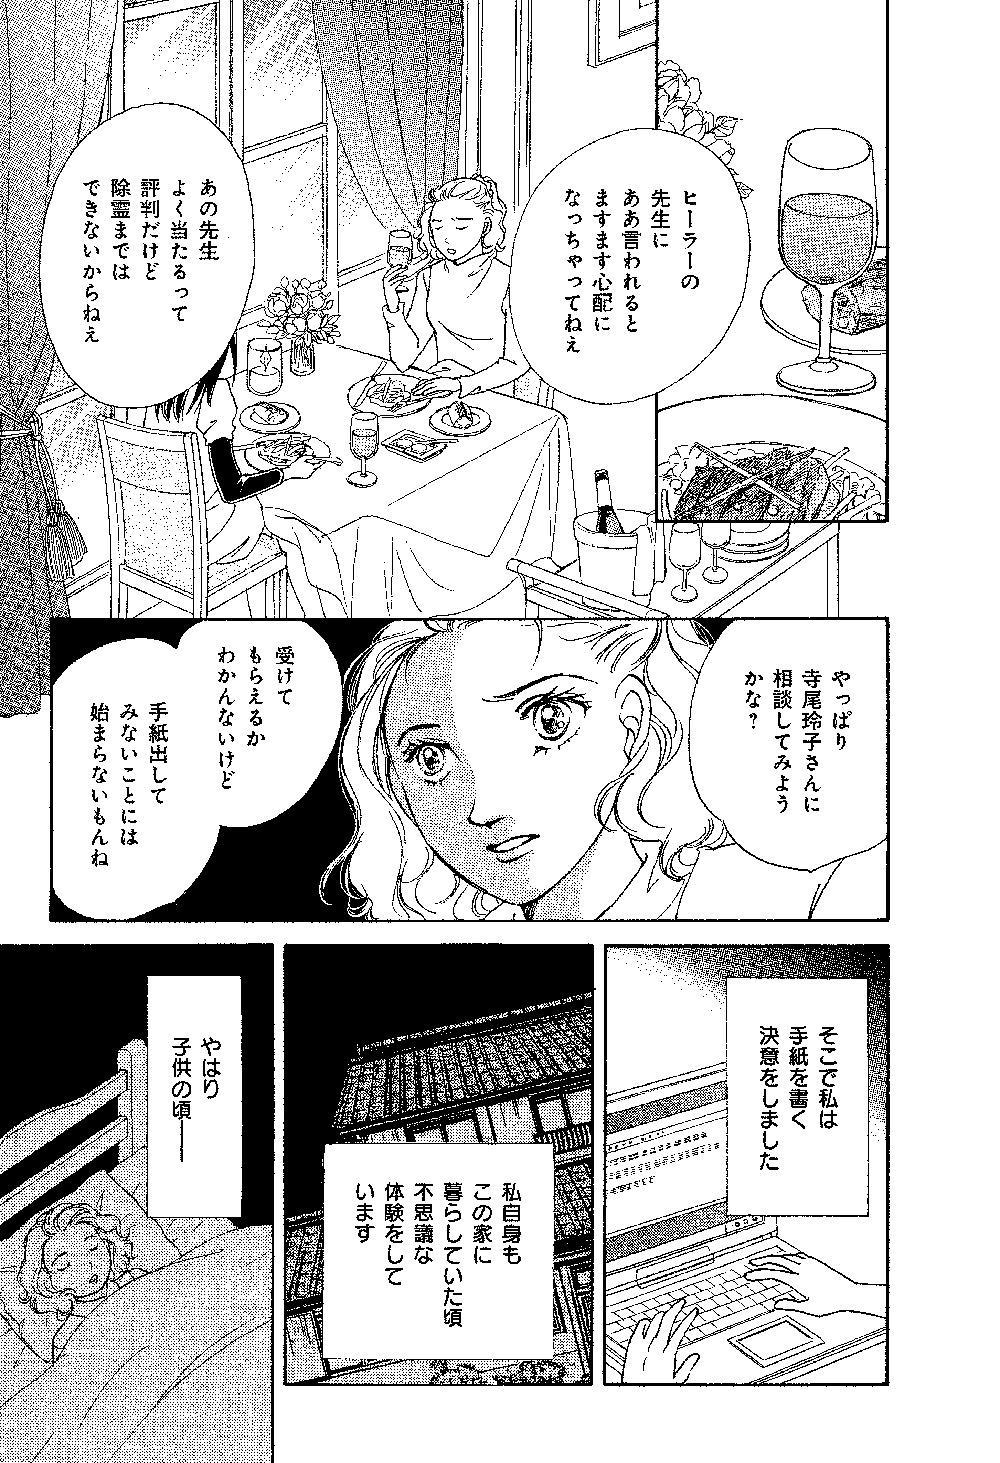 mayuri_0001_0073.jpg